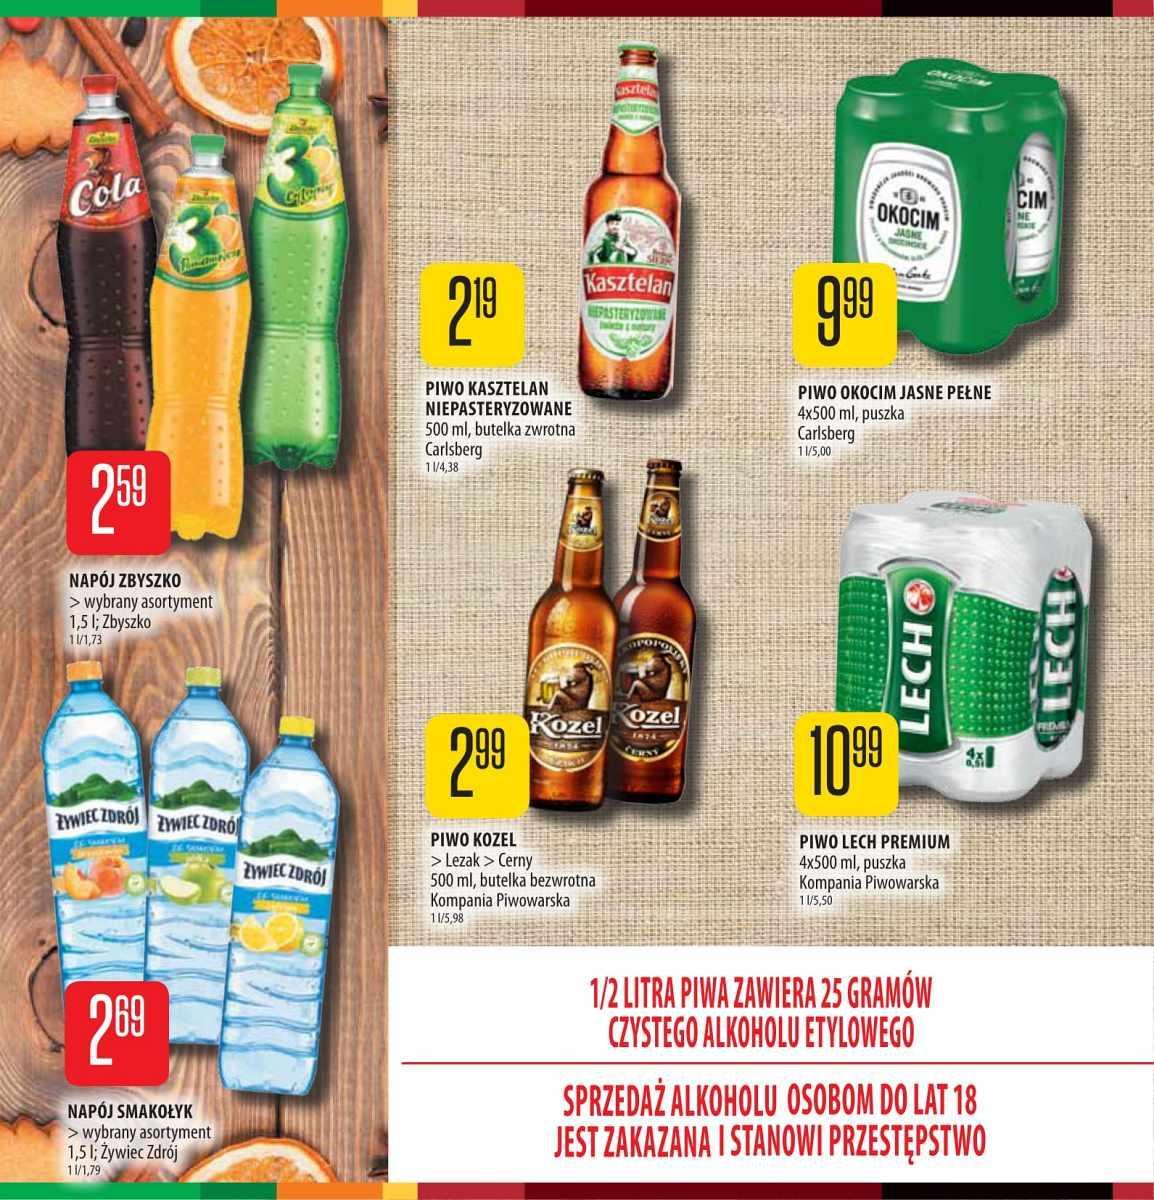 Gazetka promocyjna Chata Polska do 13/12/2017 str.10